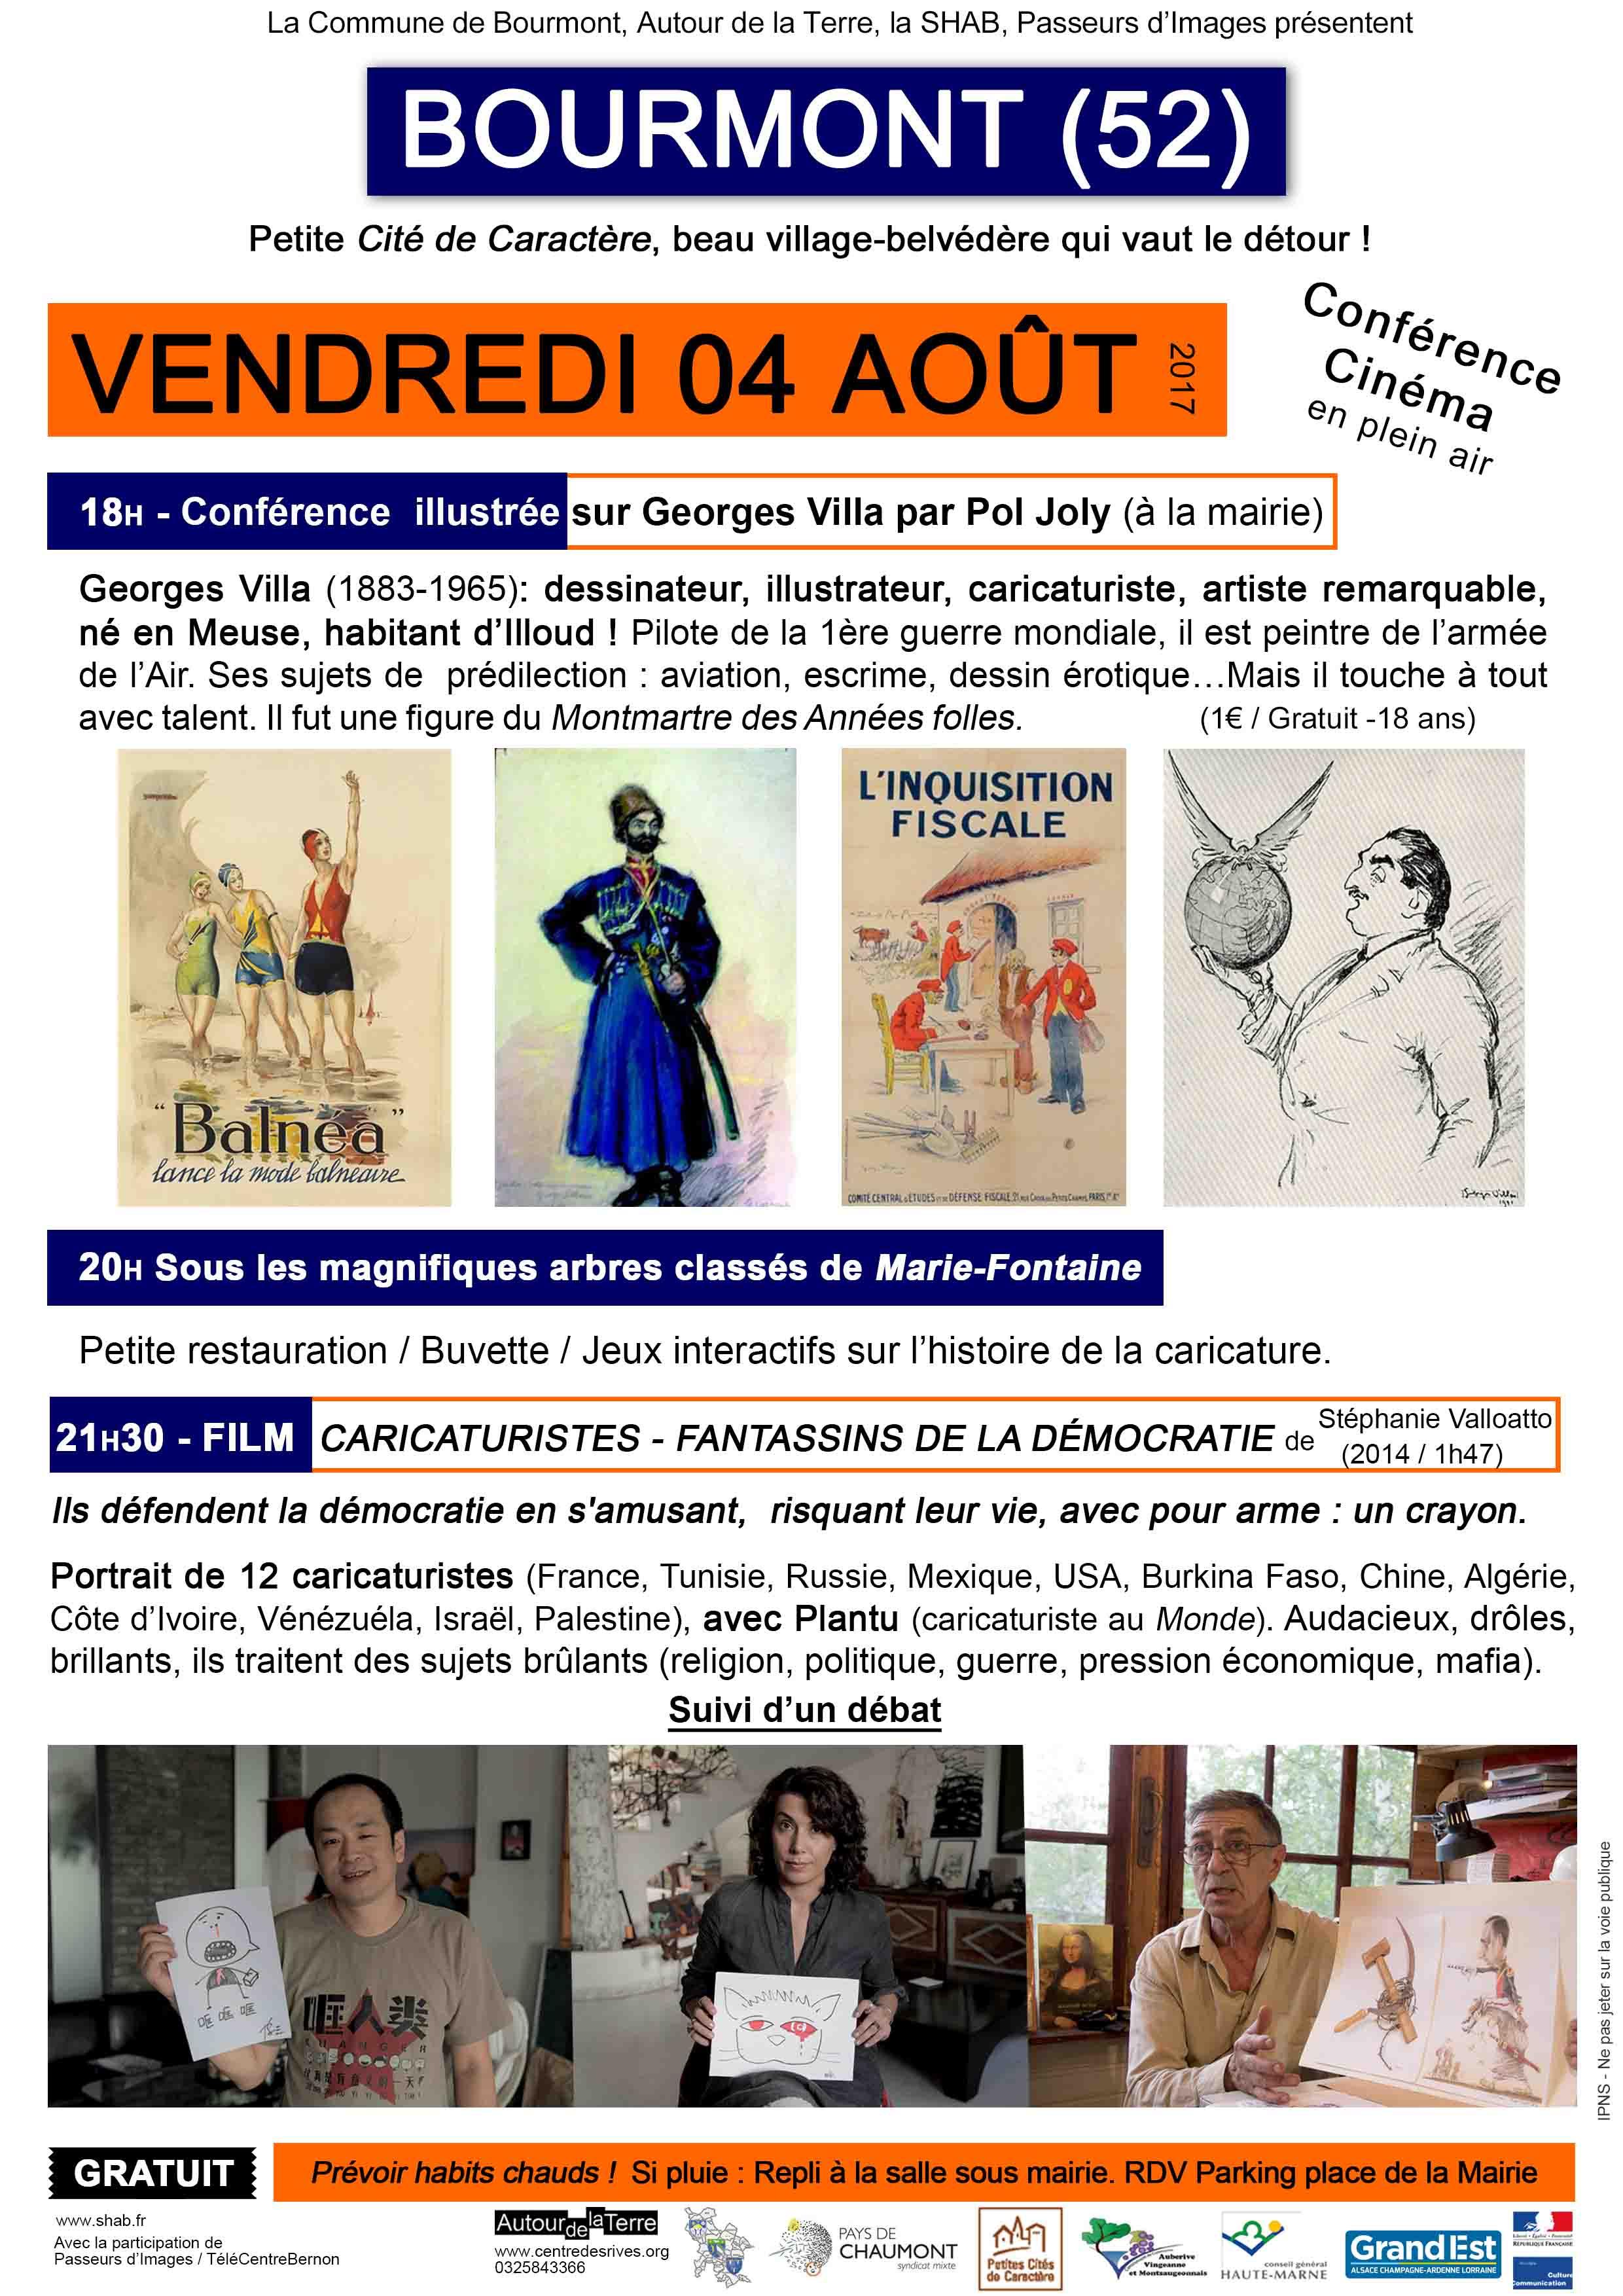 bourmont_caricaturistes